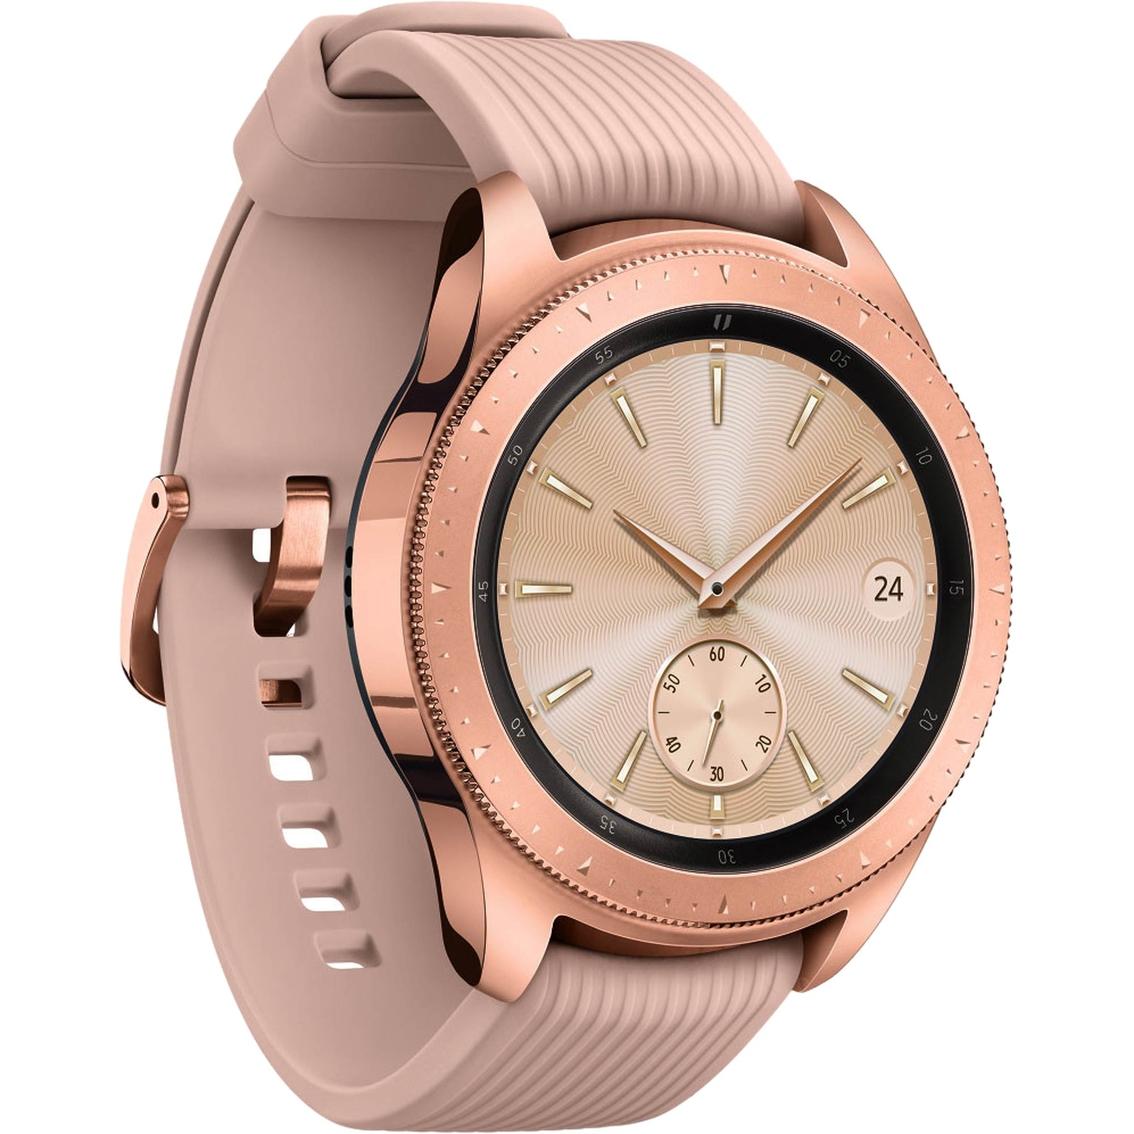 Samsung Galaxy Watch Bluetooth 42mm | Electronics | Shop The